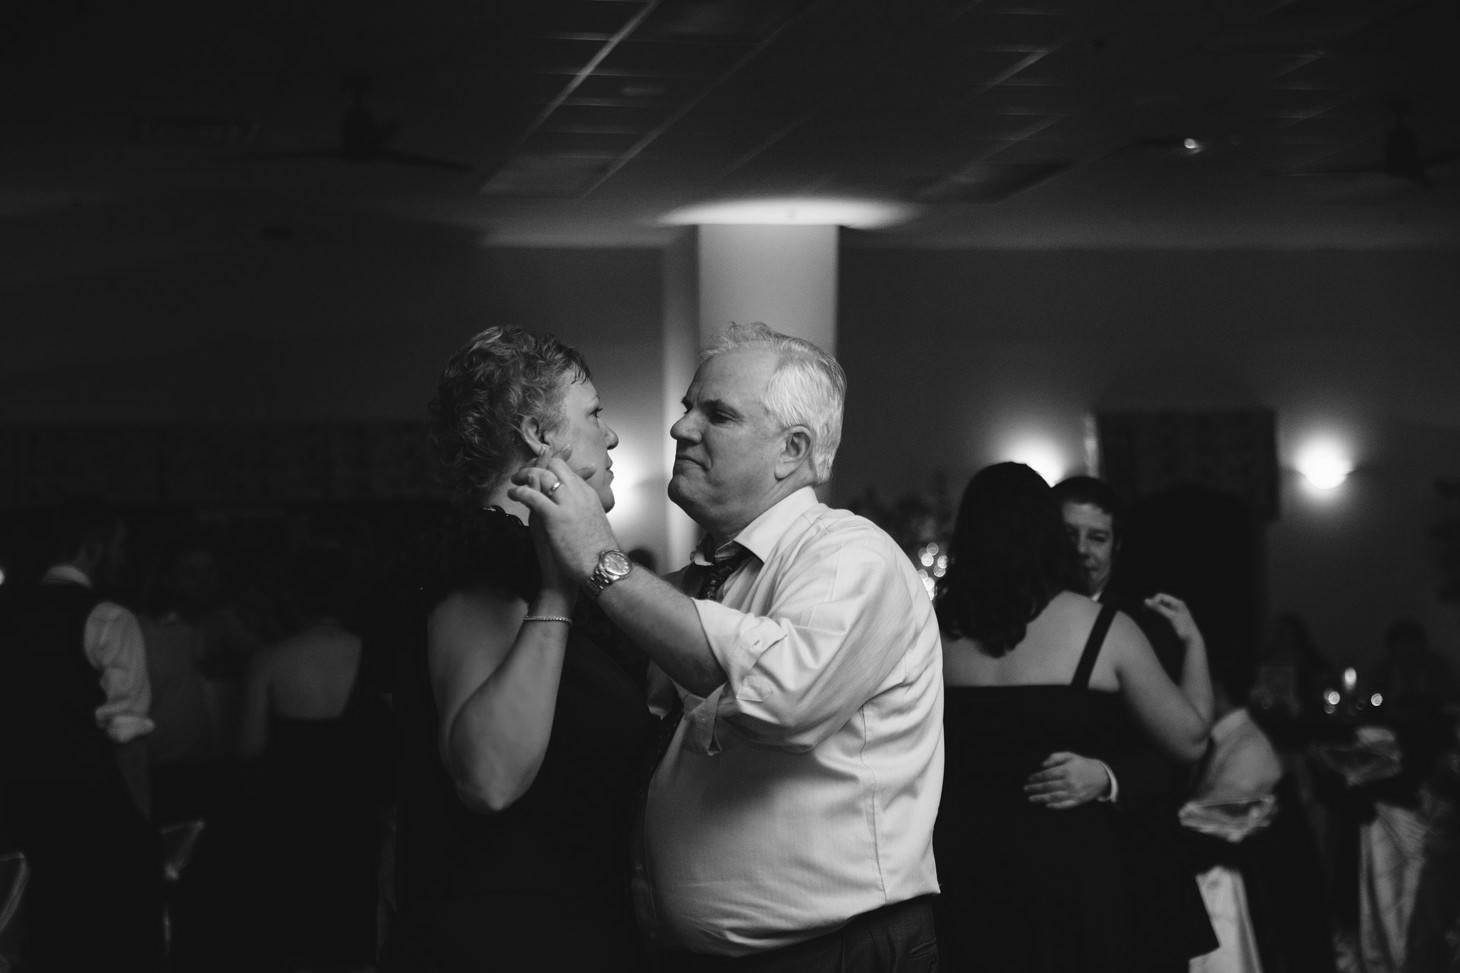 060-nyc-wedding-photographer-nj-nerdy-dr-who-firehouse-wedding-smitten-chickens.jpg